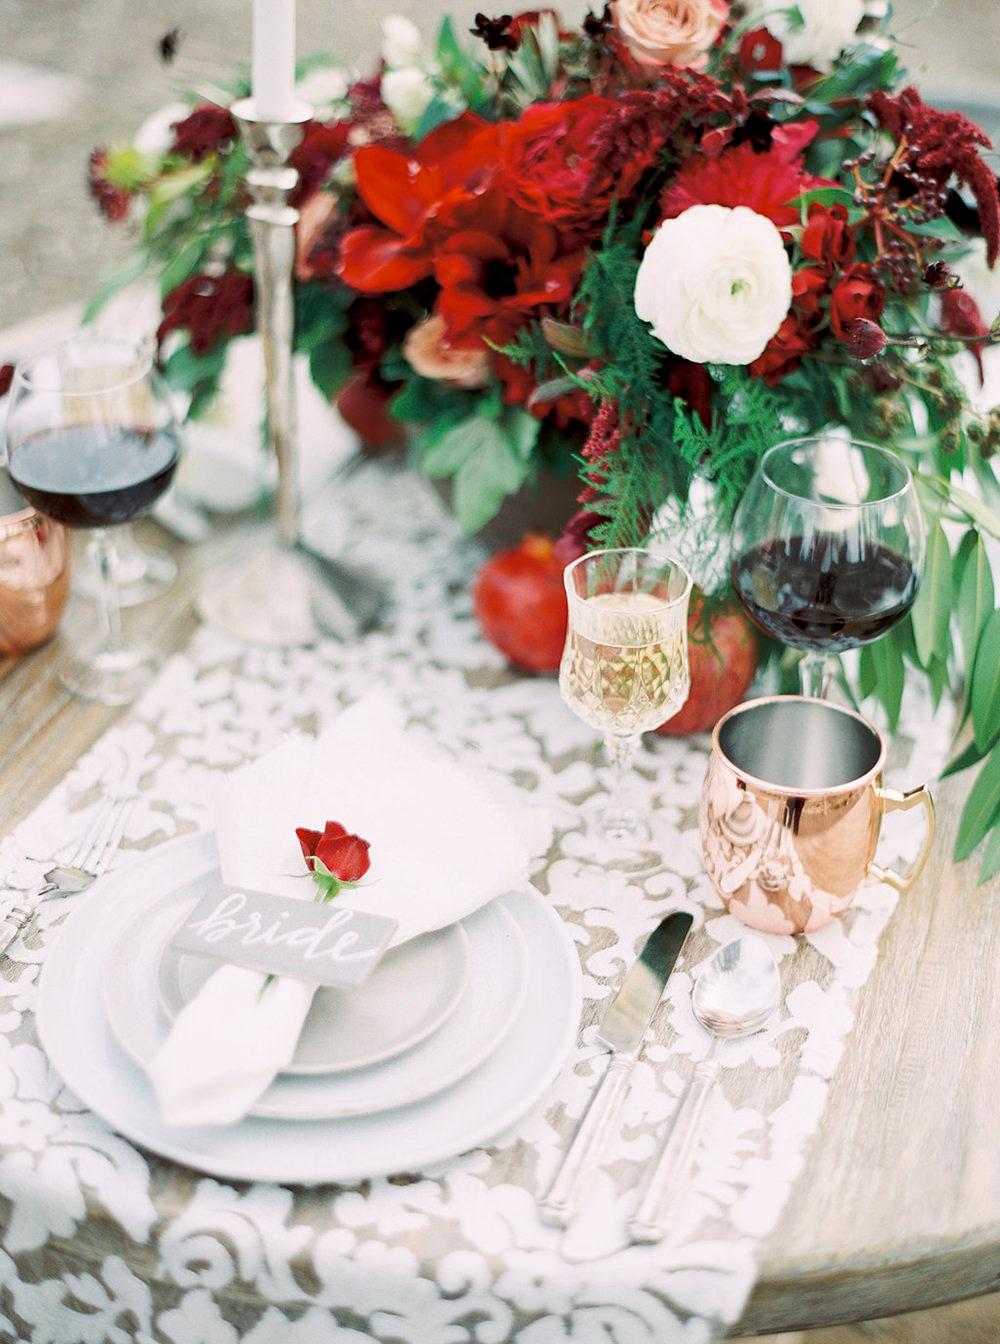 wedding place settings - photo by Amanda Lenhardt https://ruffledblog.com/relaxed-san-juan-capistrano-wedding-inspiration